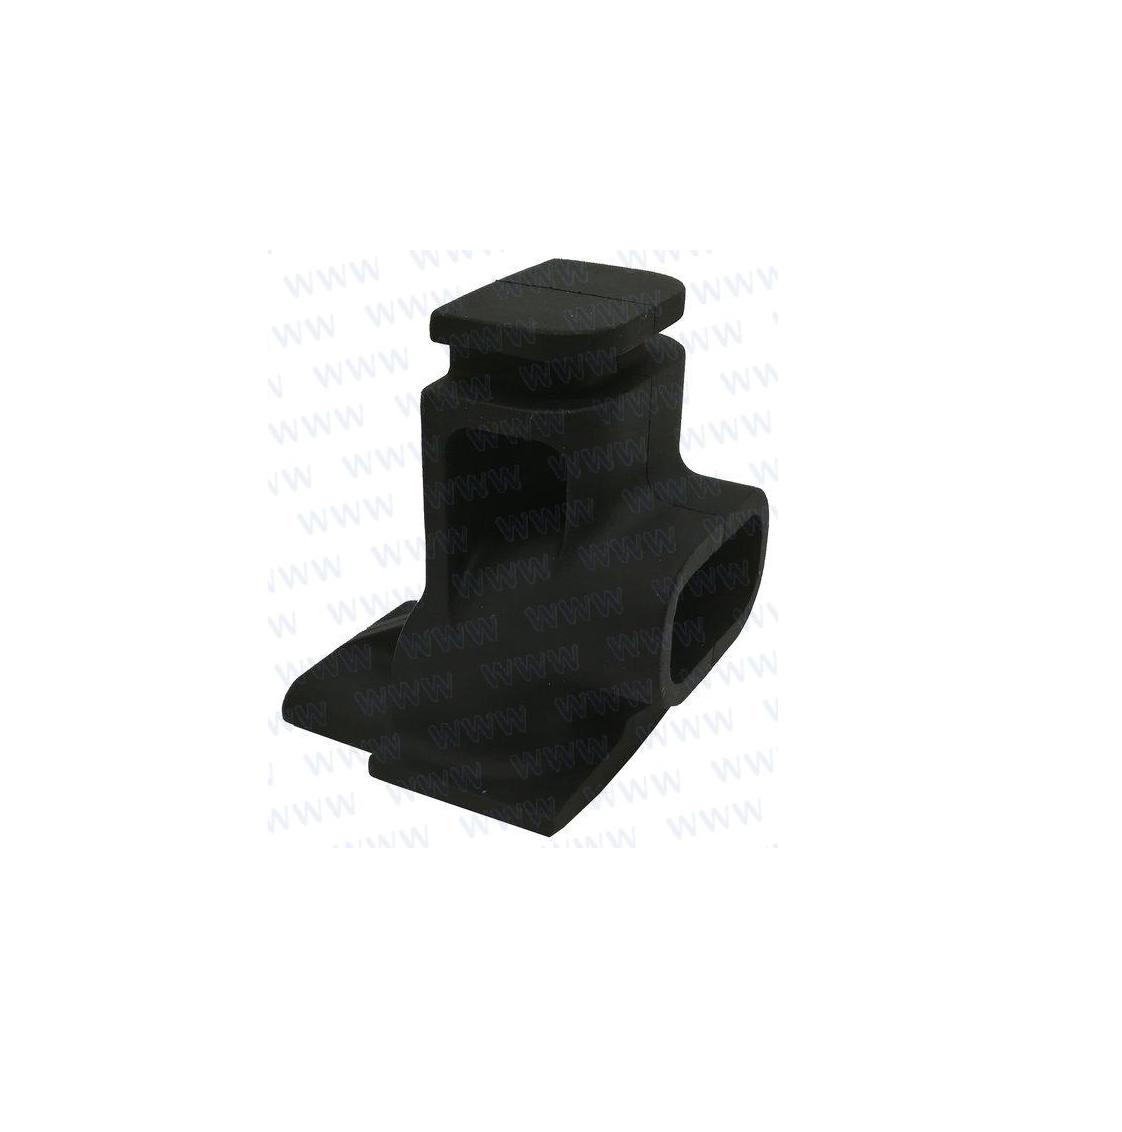 Parsun F50, F60 GUIDE RUBBER B (PAF60-02000006)